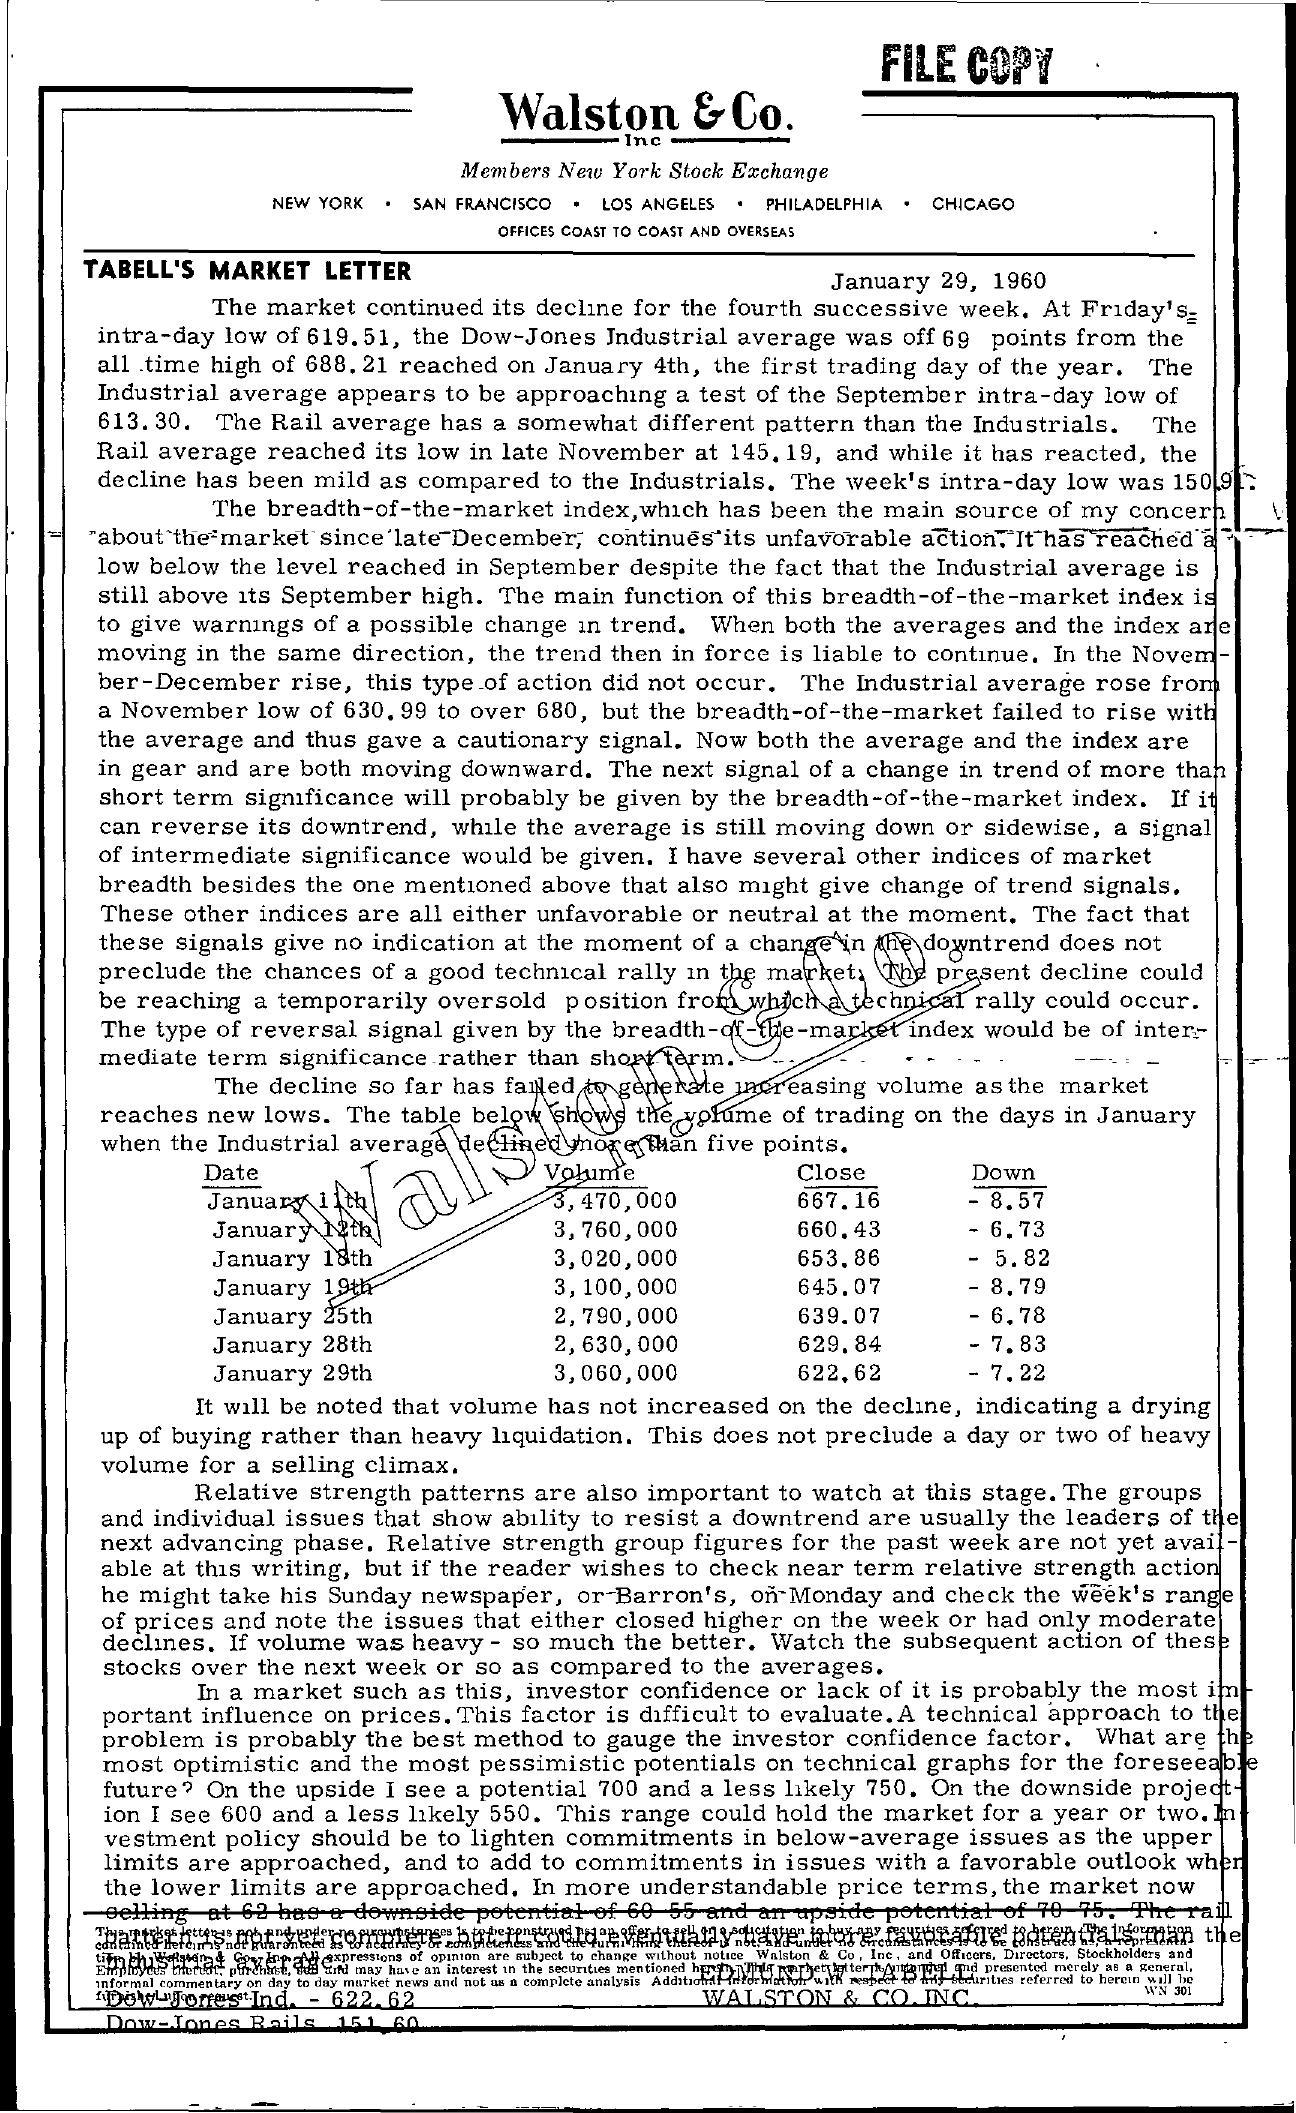 Tabell's Market Letter - January 29, 1960